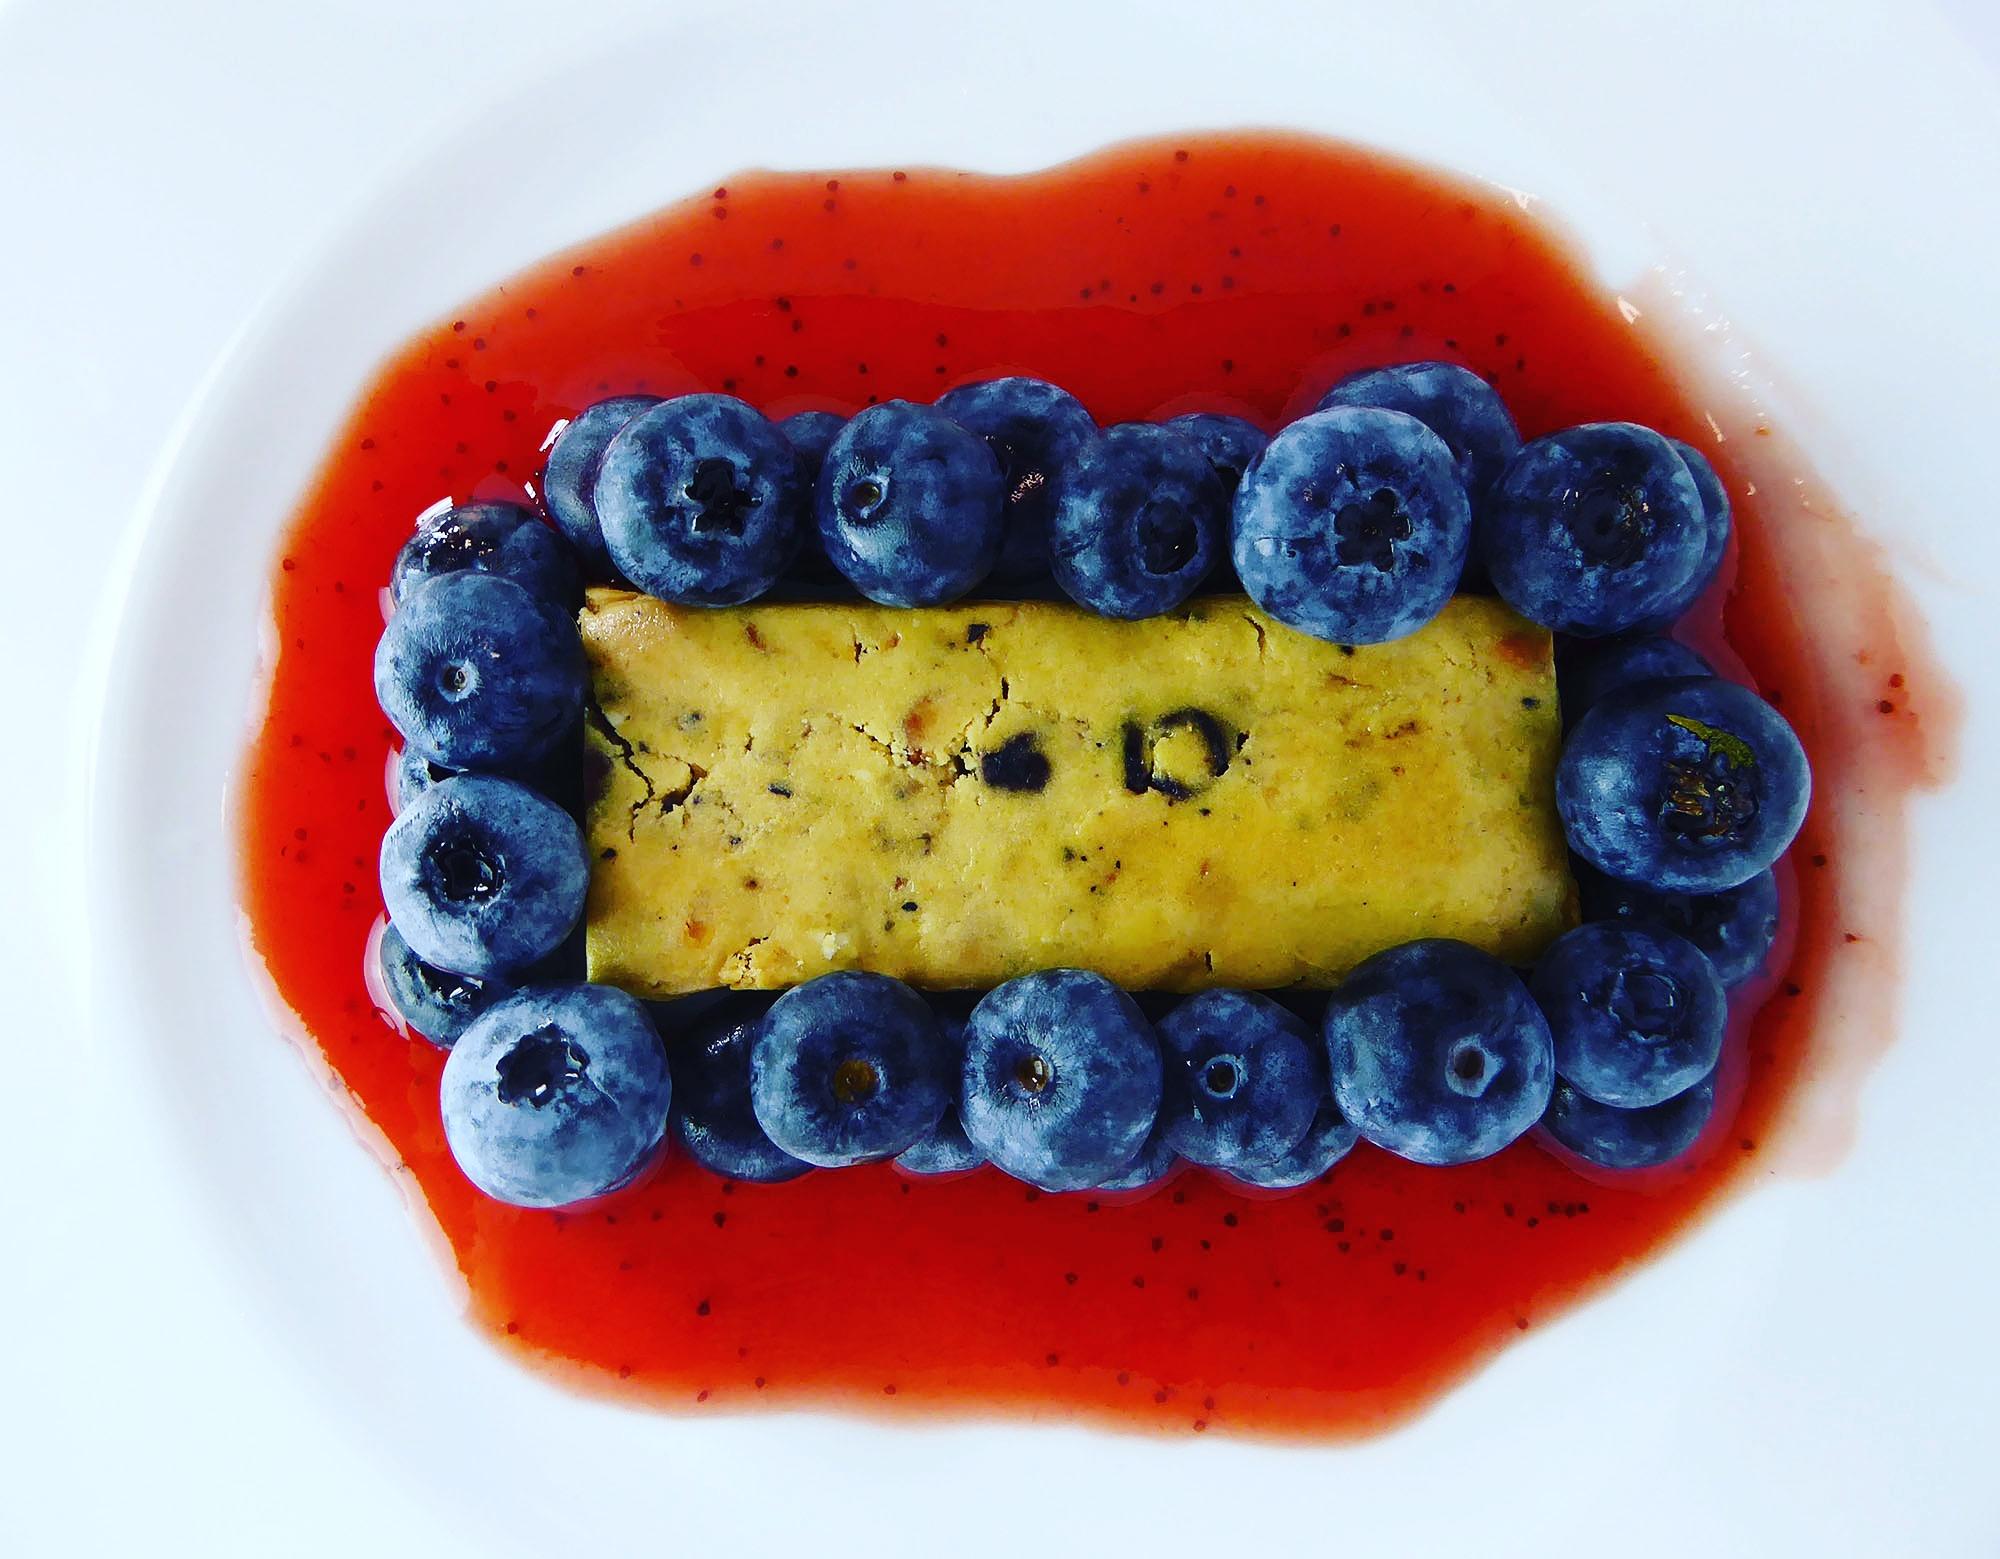 Questbar Blueberry Muffin Protein Bar strawberry sauce blueberries